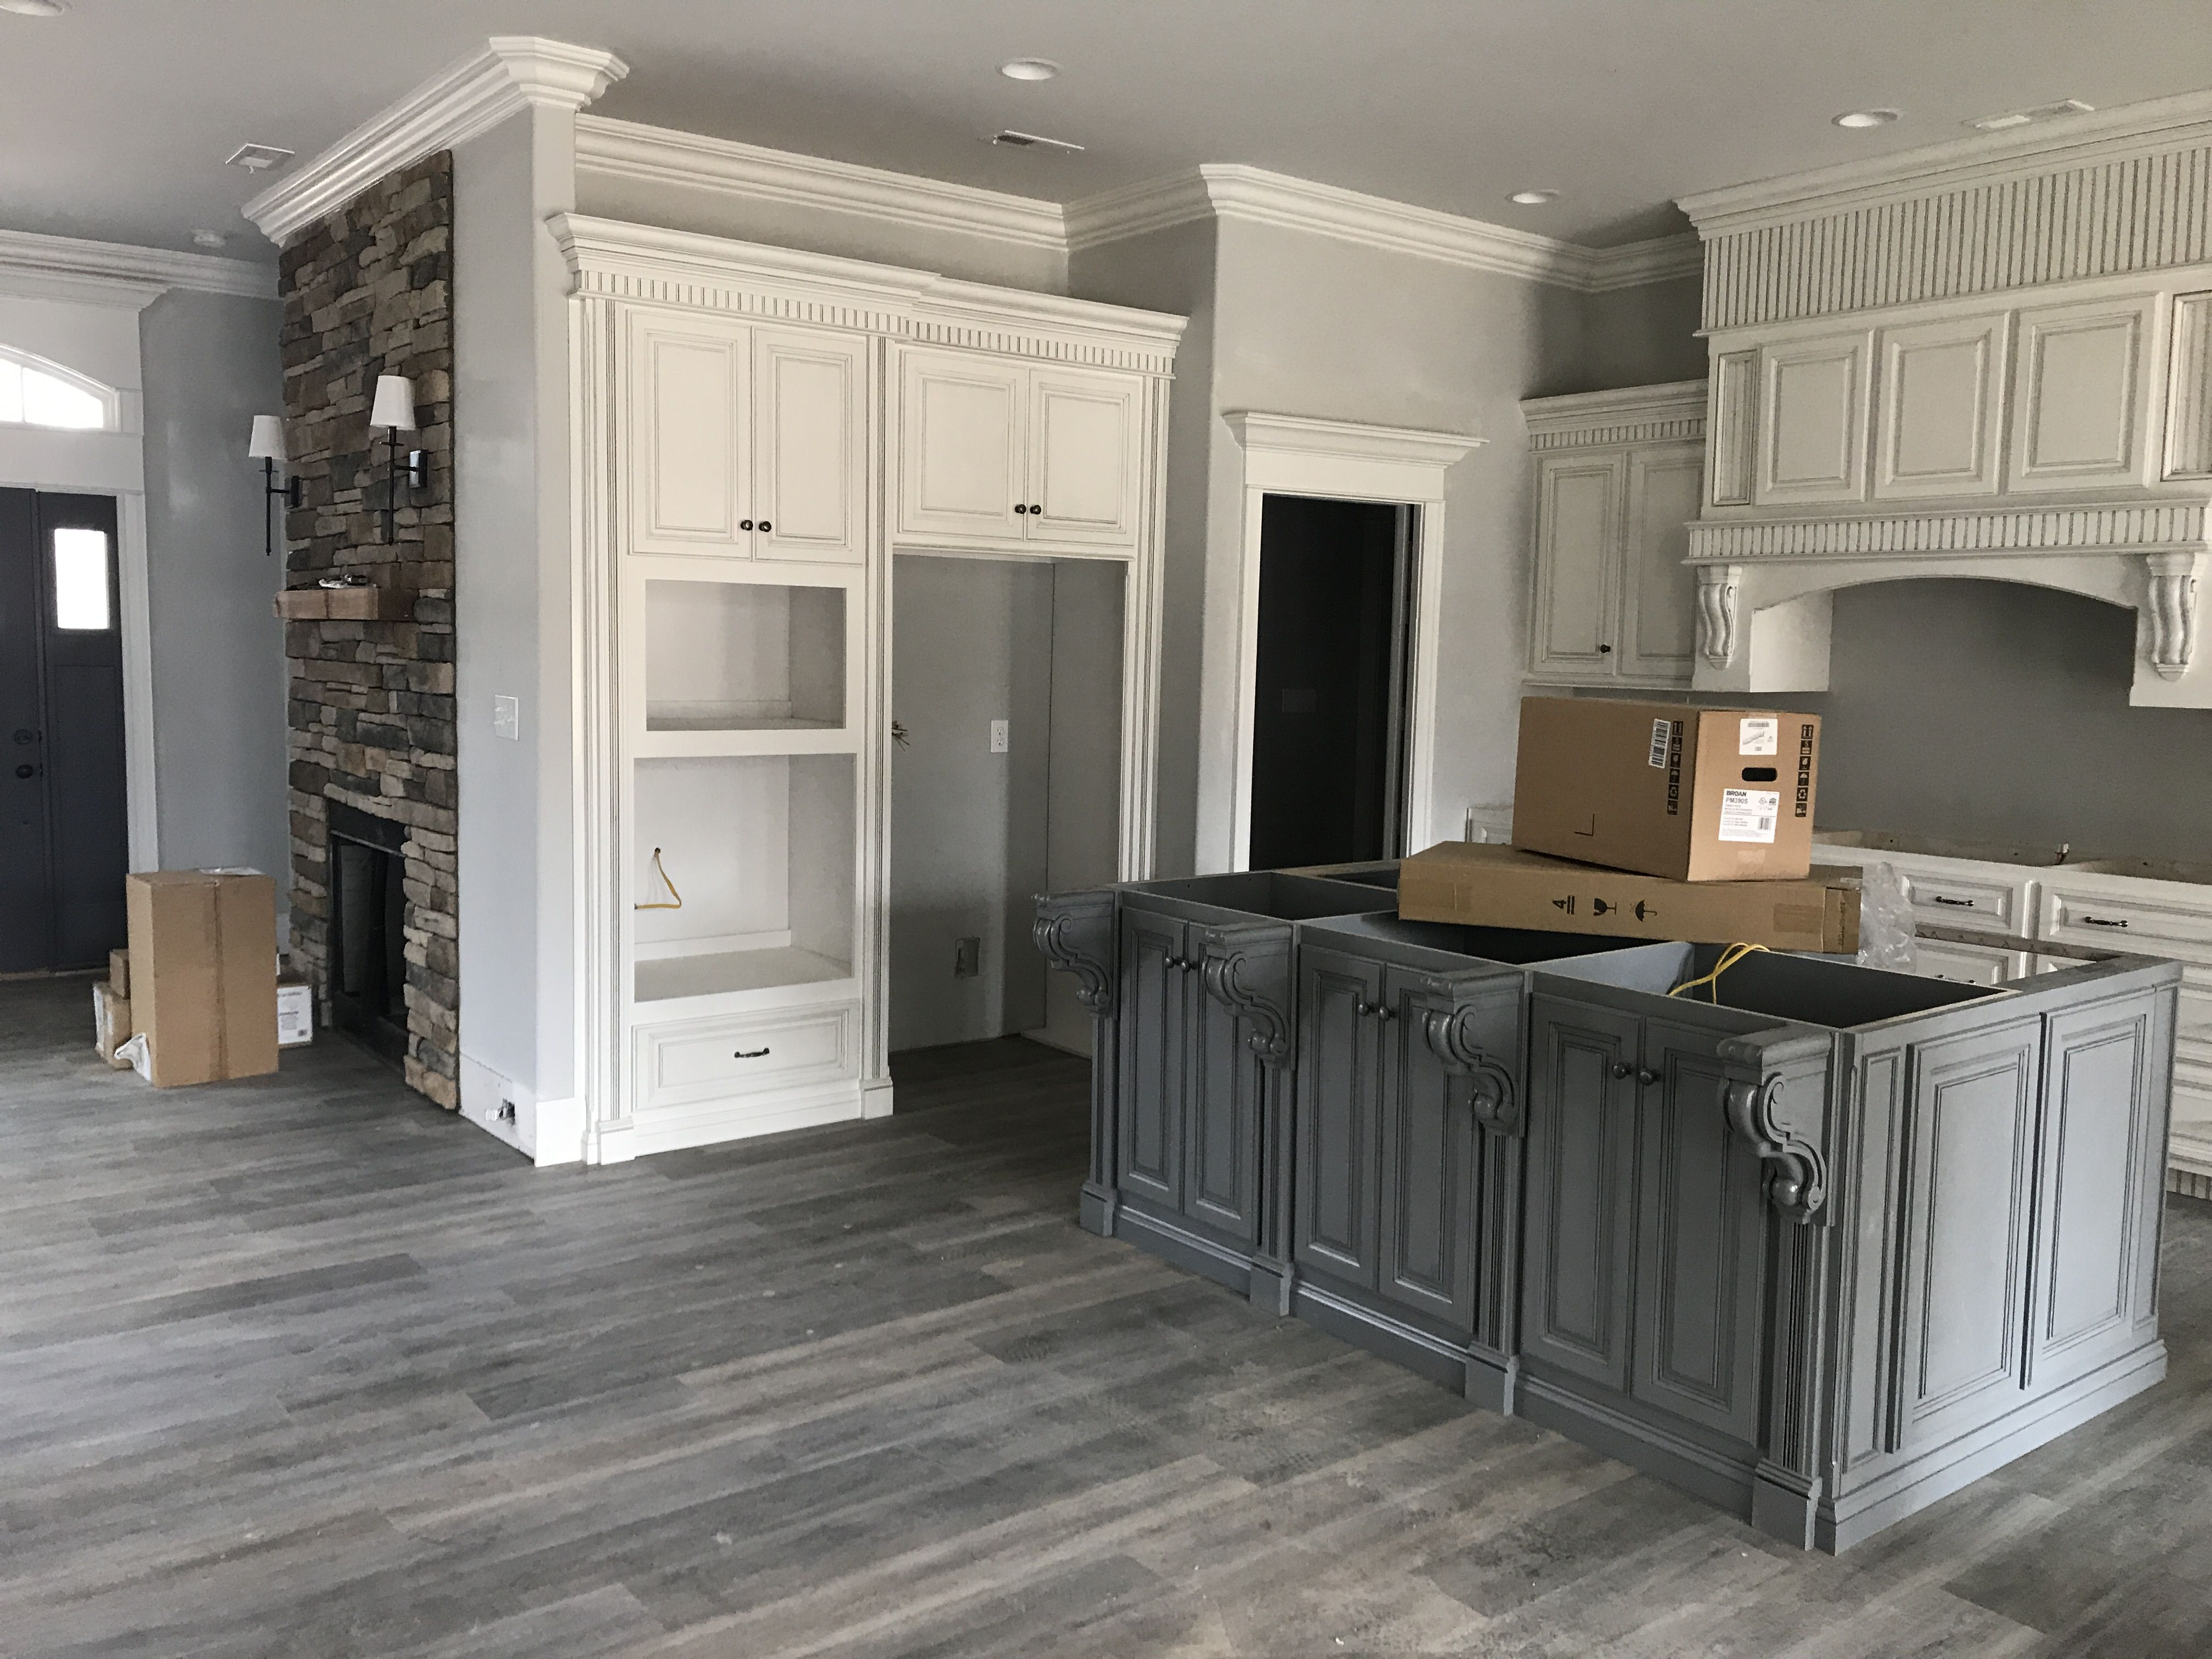 Pleasant Cove- Carpenter Family Home (2018) | Carpenter House ... on bachelor house design, guard house design, prairie house design, blue bird house design,